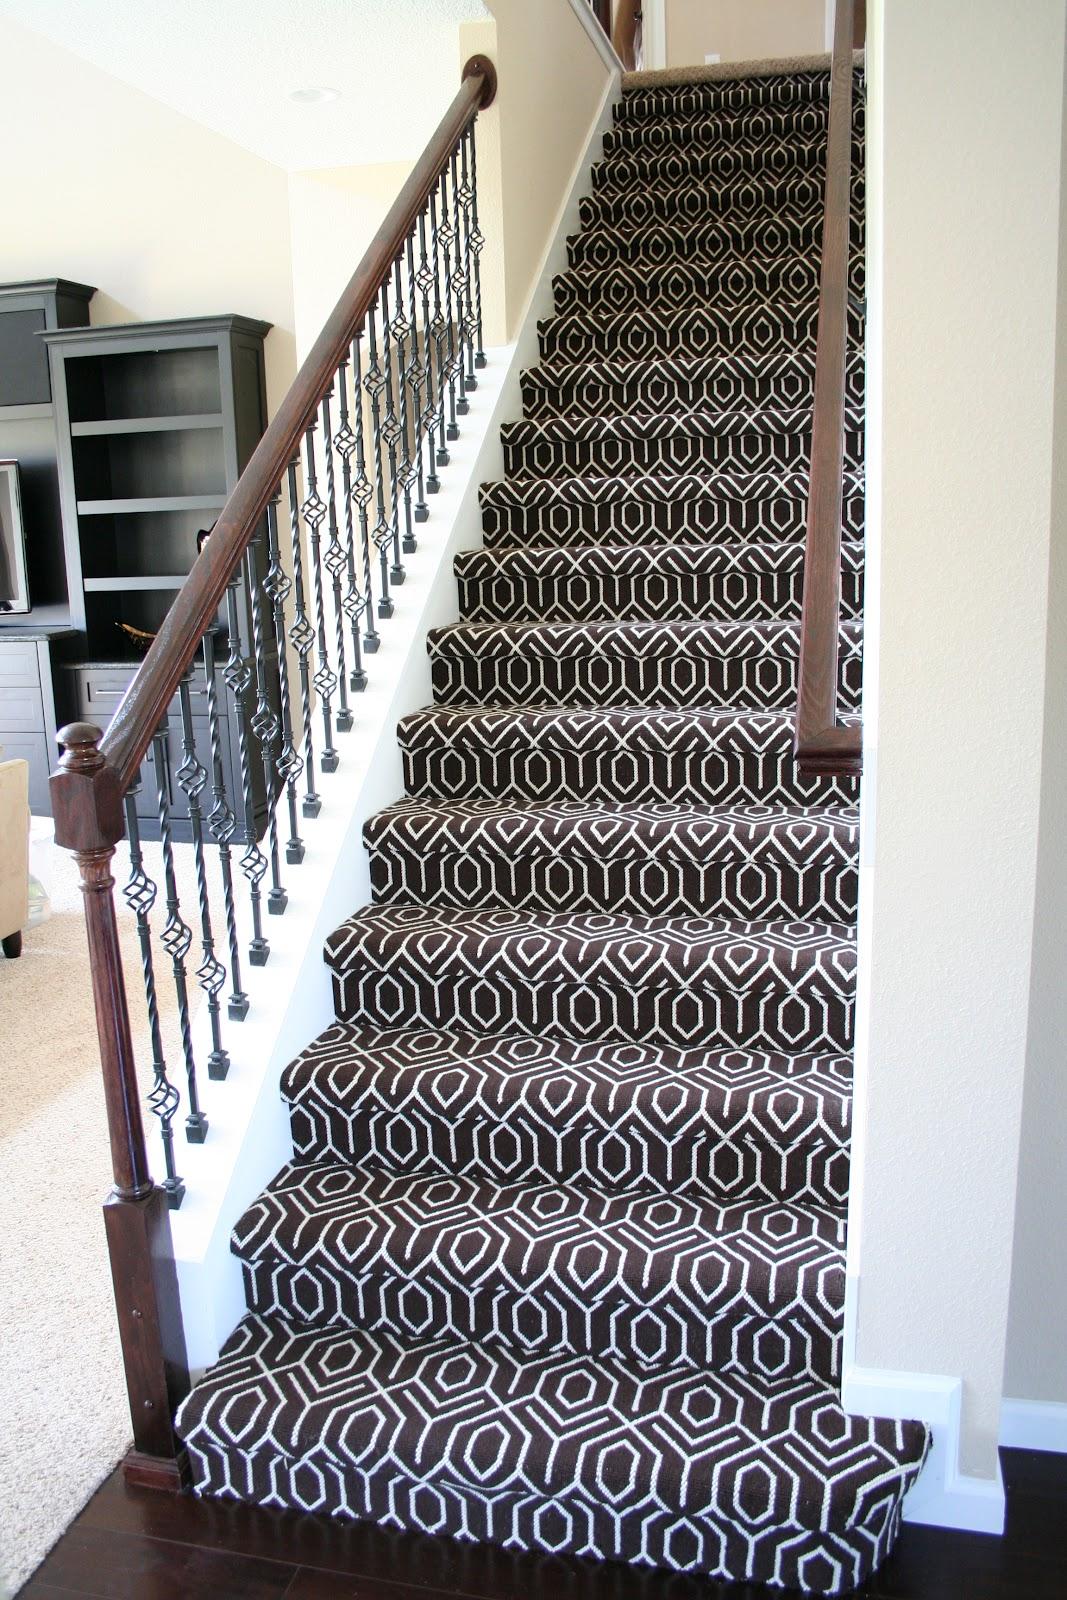 The Vernon Blog: Stair carpet